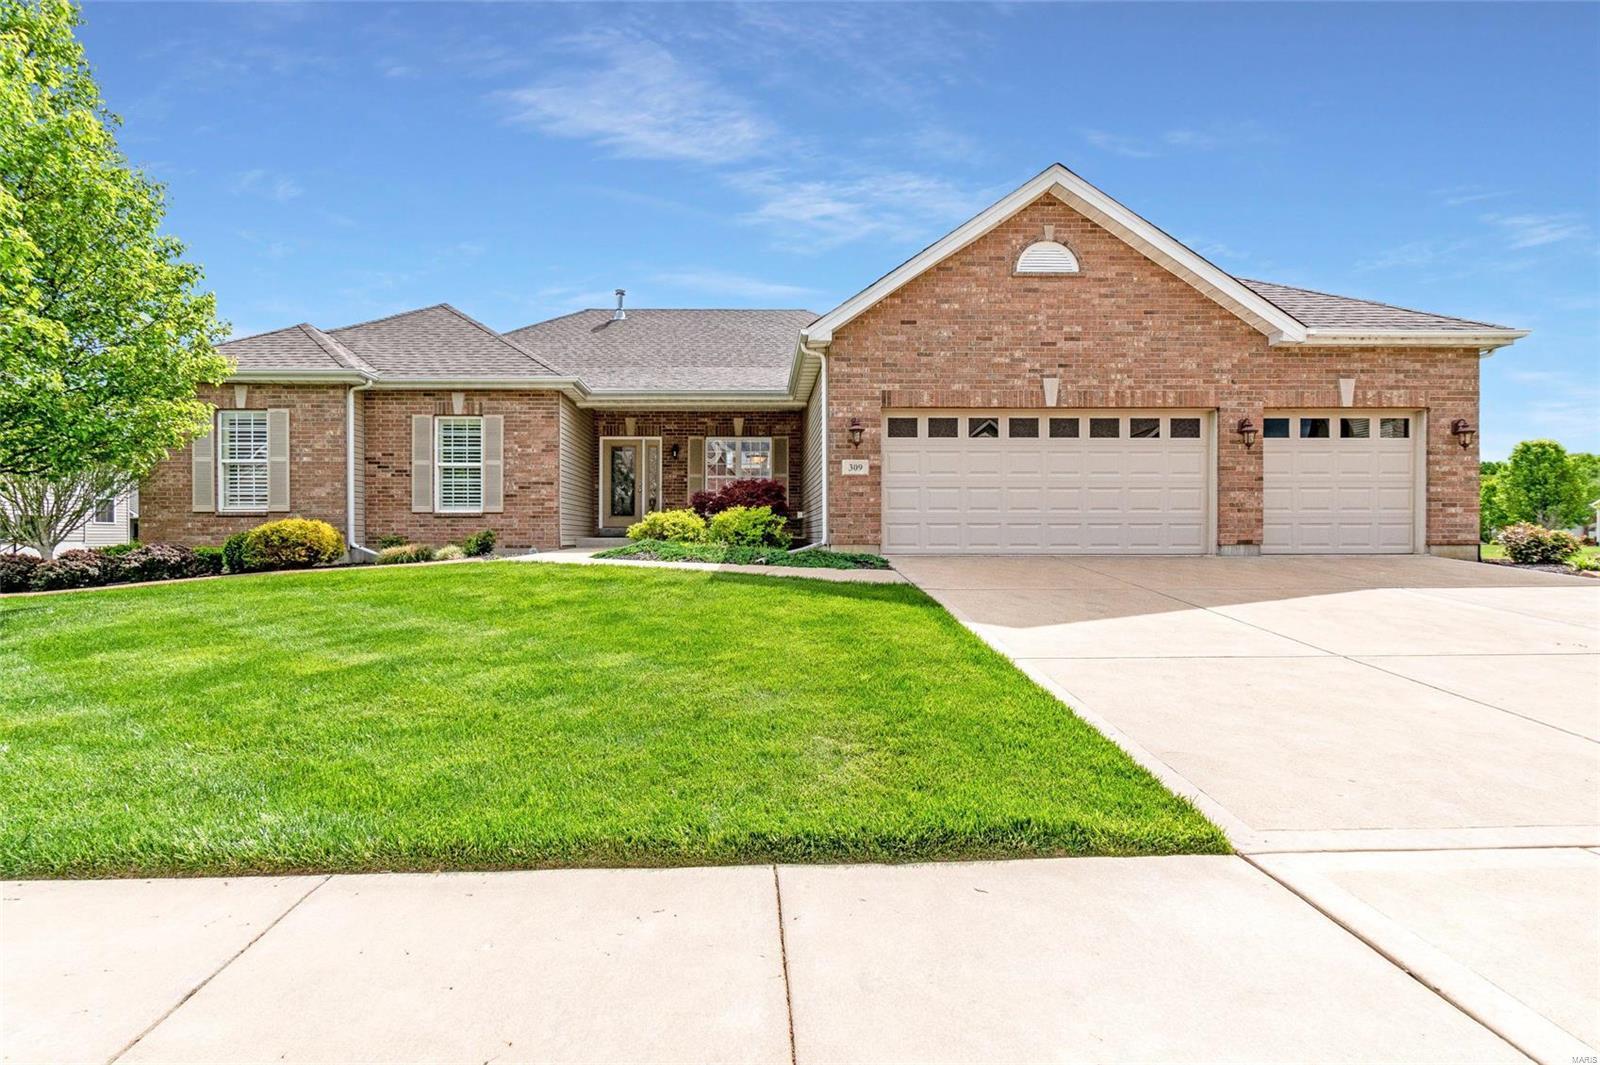 309 Trailhead Way Property Photo - Dardenne Prairie, MO real estate listing